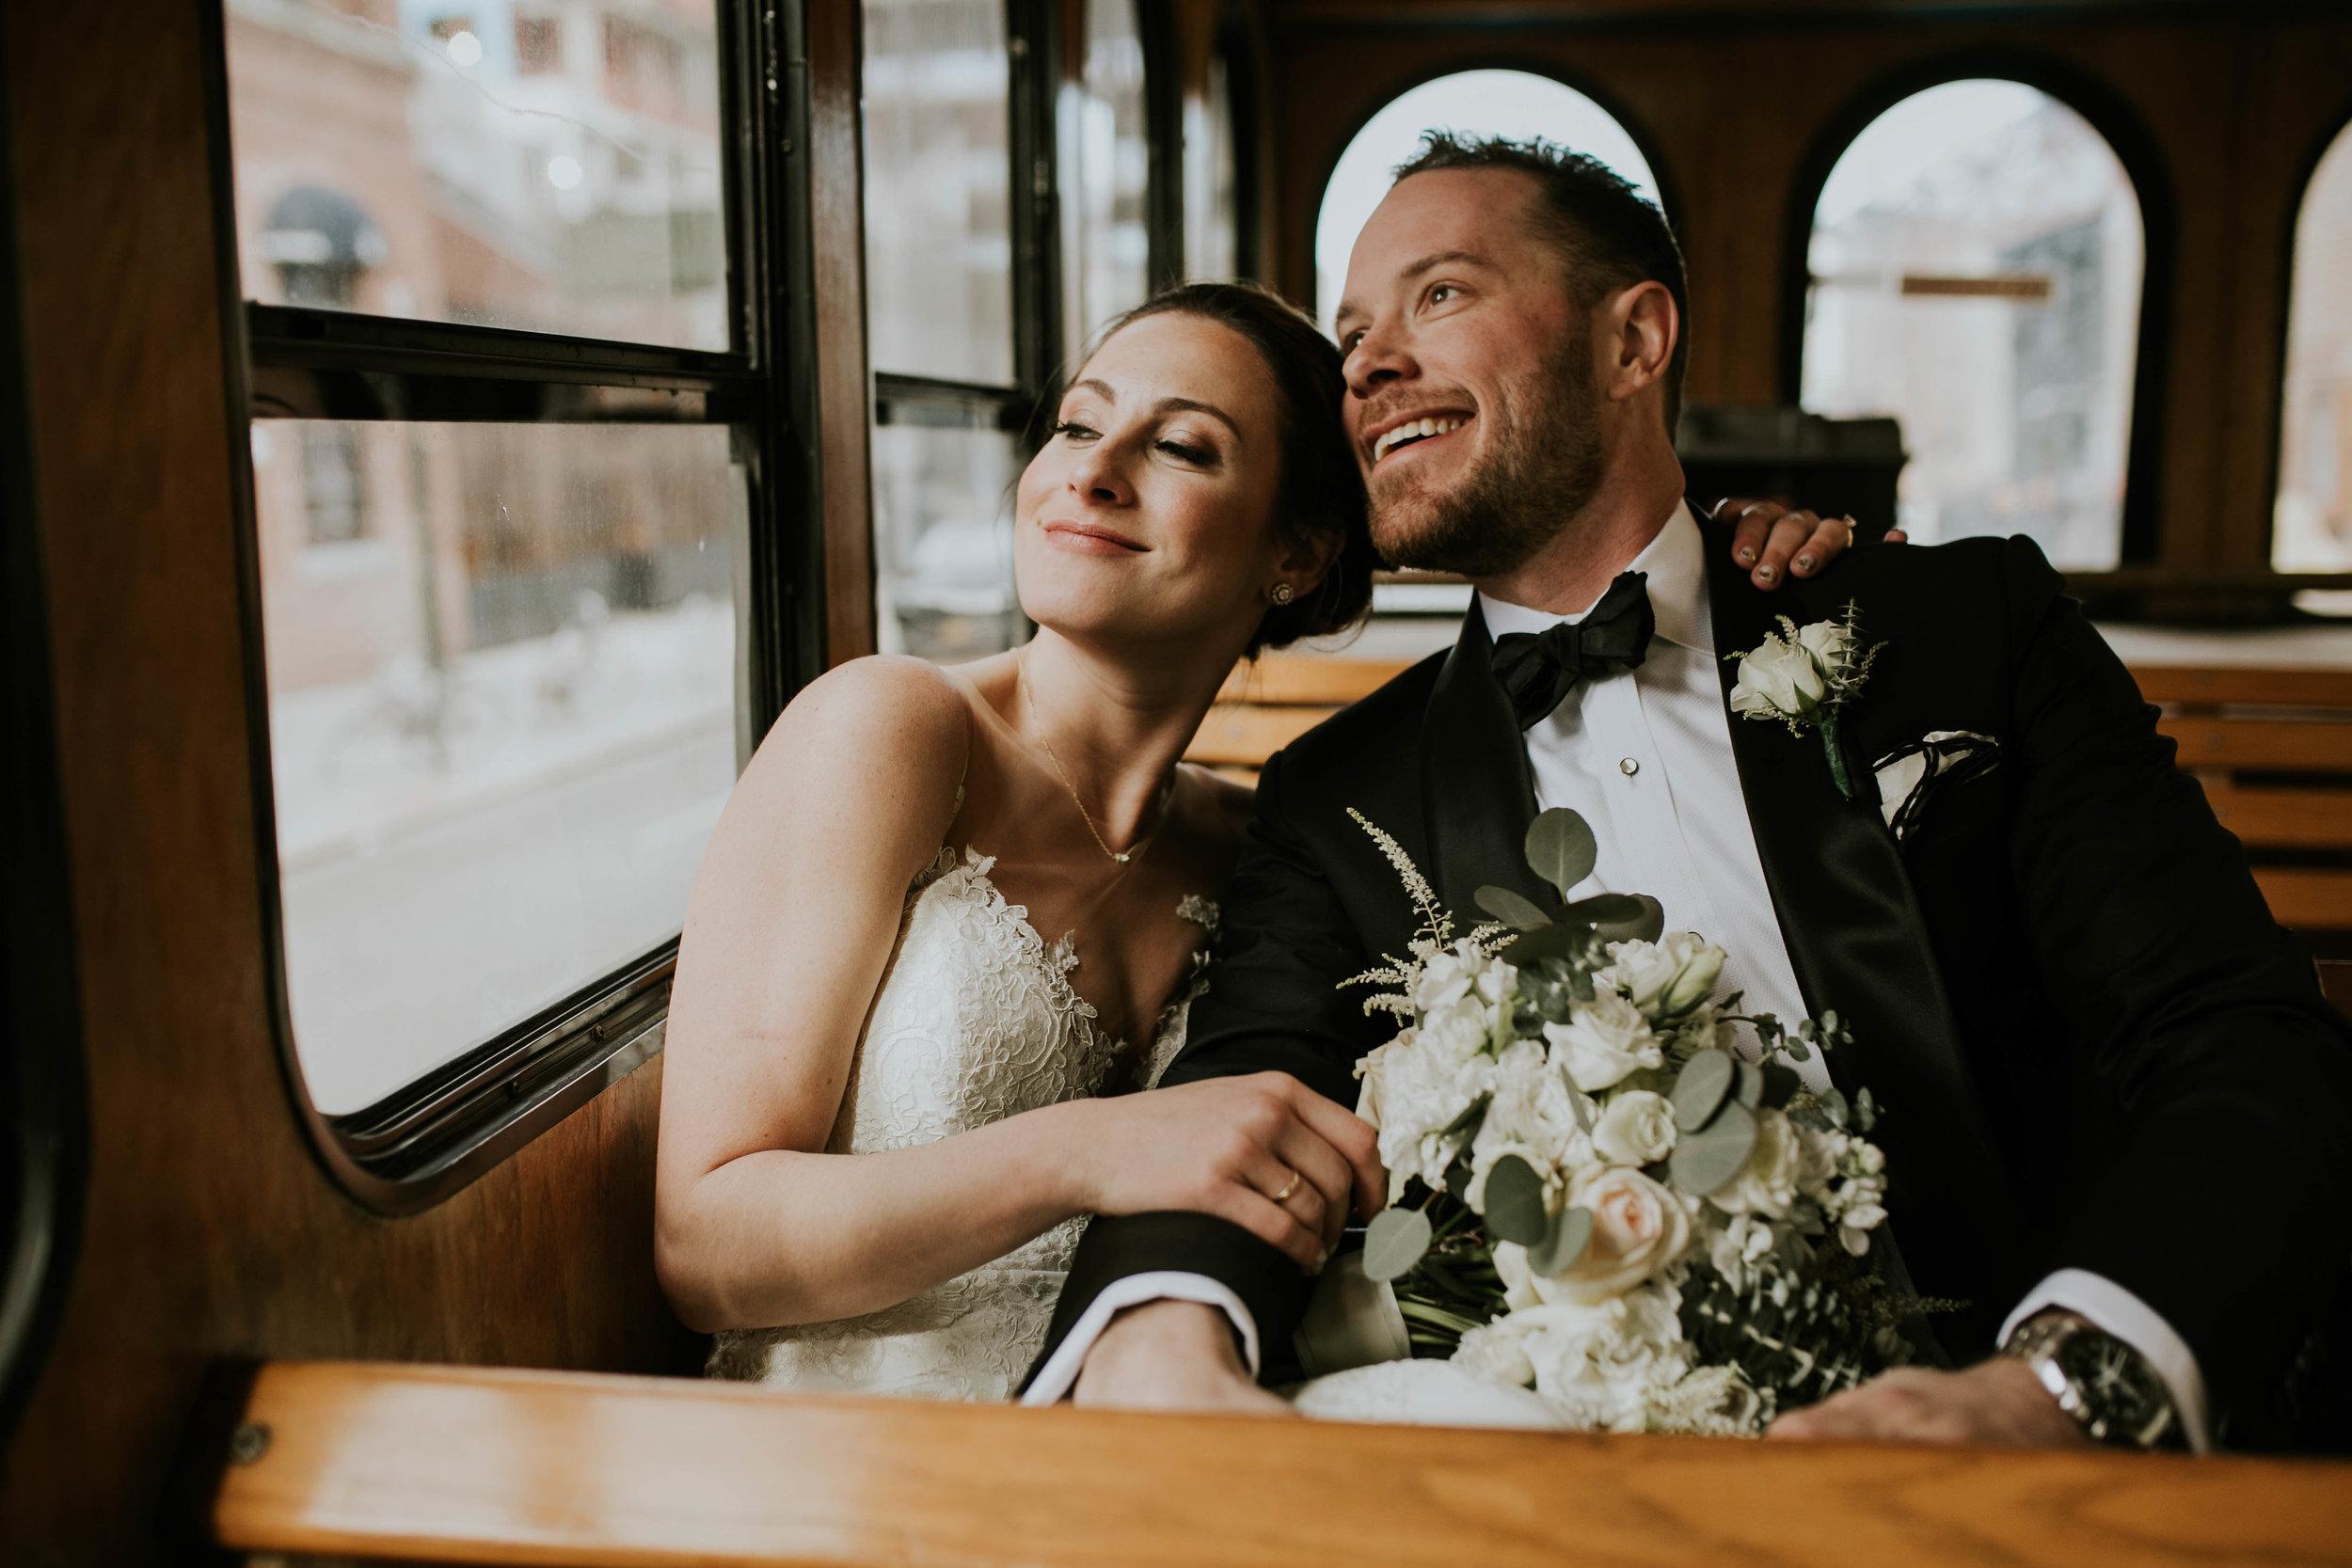 nyc wedding couple on a trolley limo